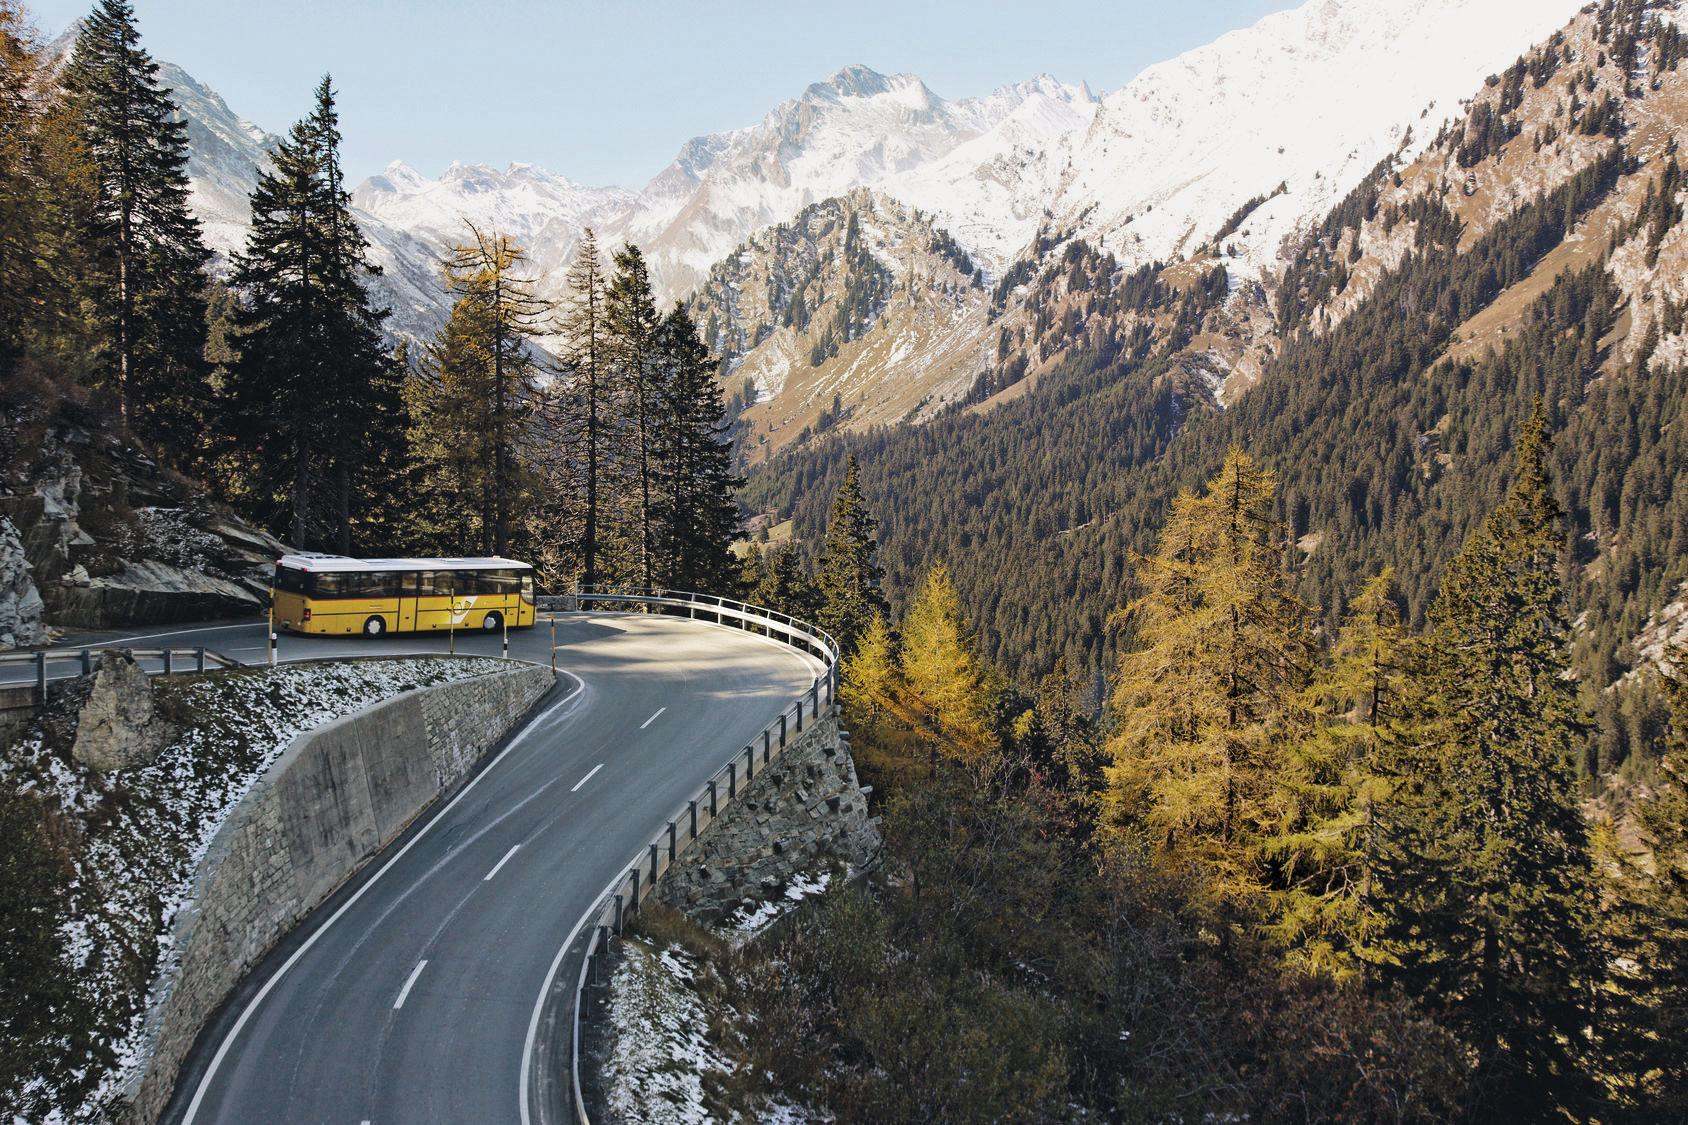 Swiss Travel System - PostAuto